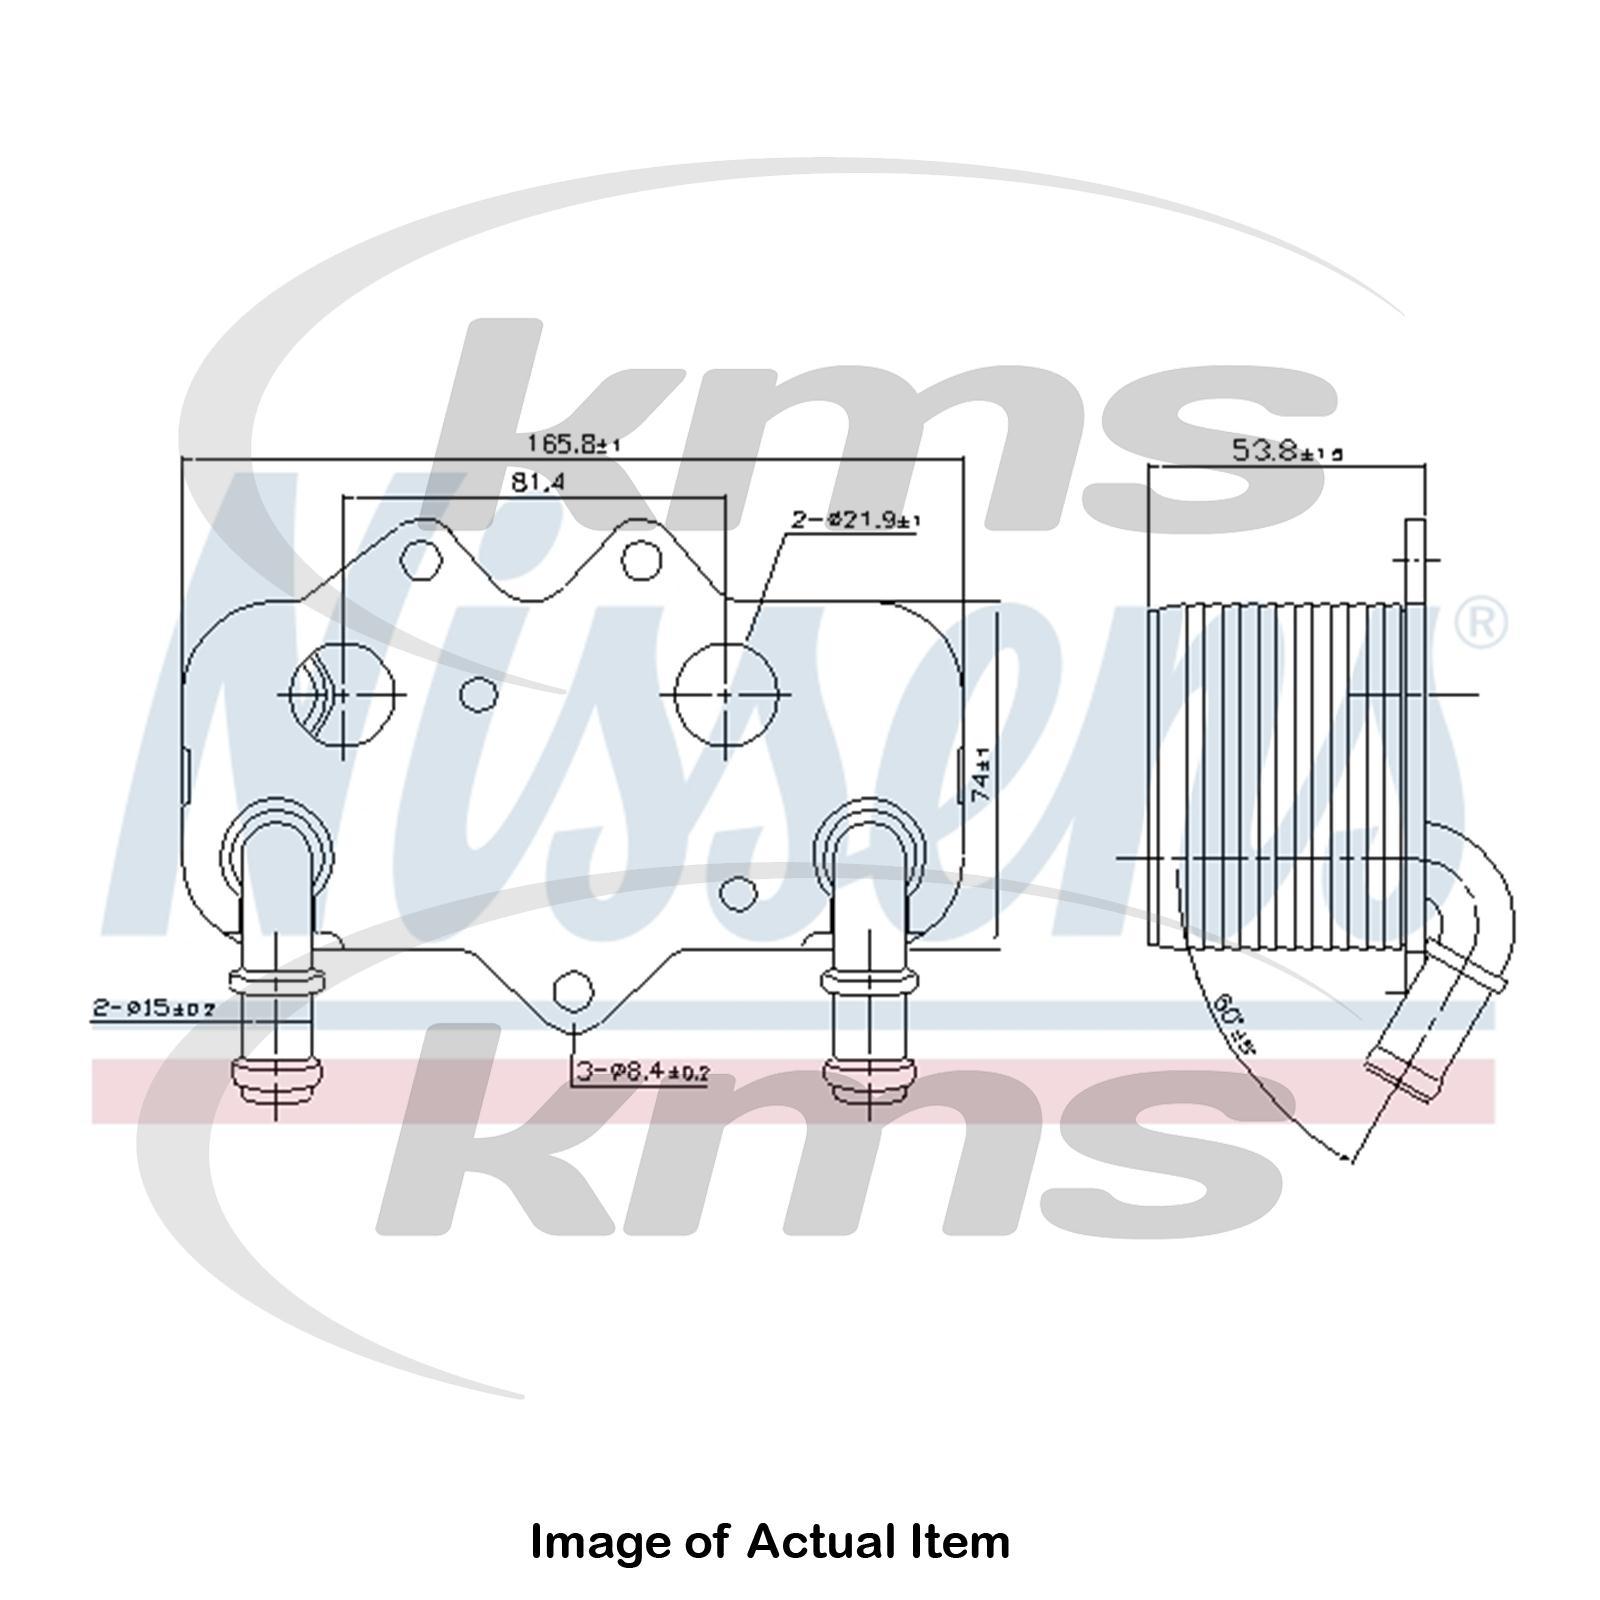 New Genuine Nissens Engine Oil Cooler 90781 Top Quality Ebay Audi 2000 2 8l Diagram Sentinel Thumbnail